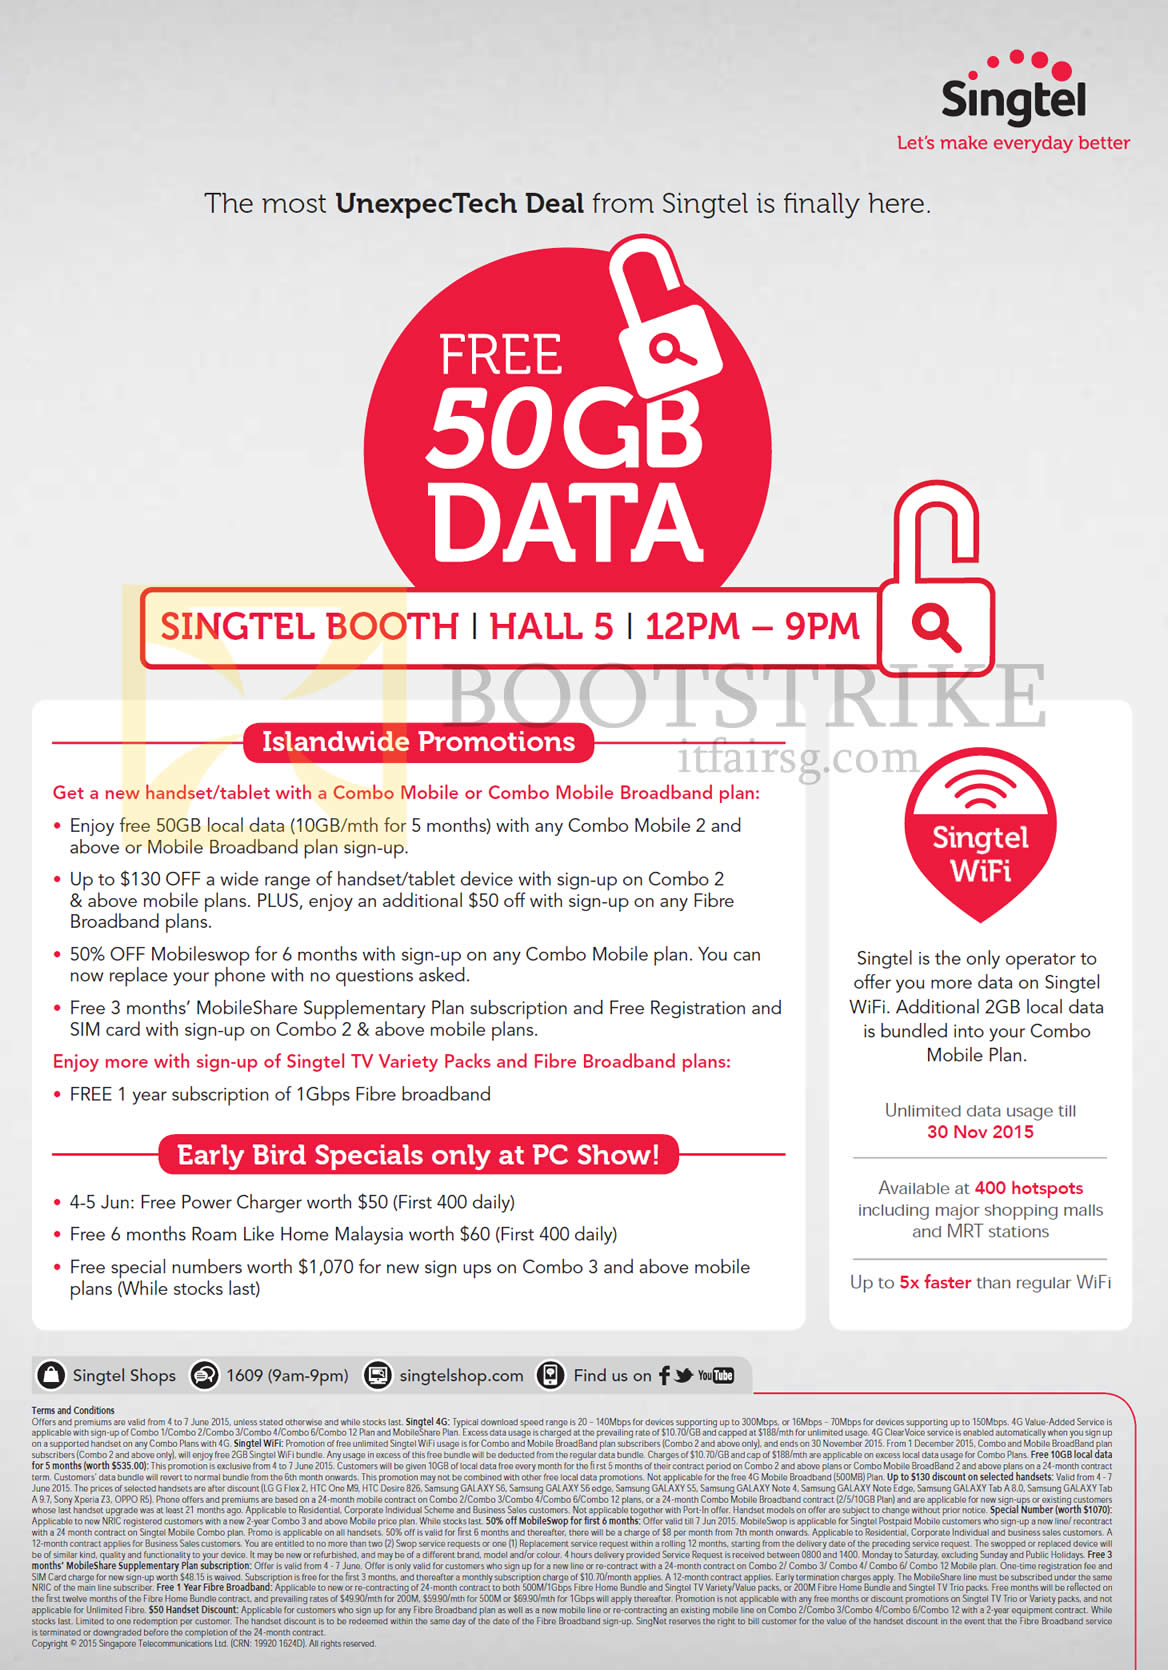 Singtel PC SHOW 2015 Broadband, Mobile & TV Offers 4 – 7 Jun 2015